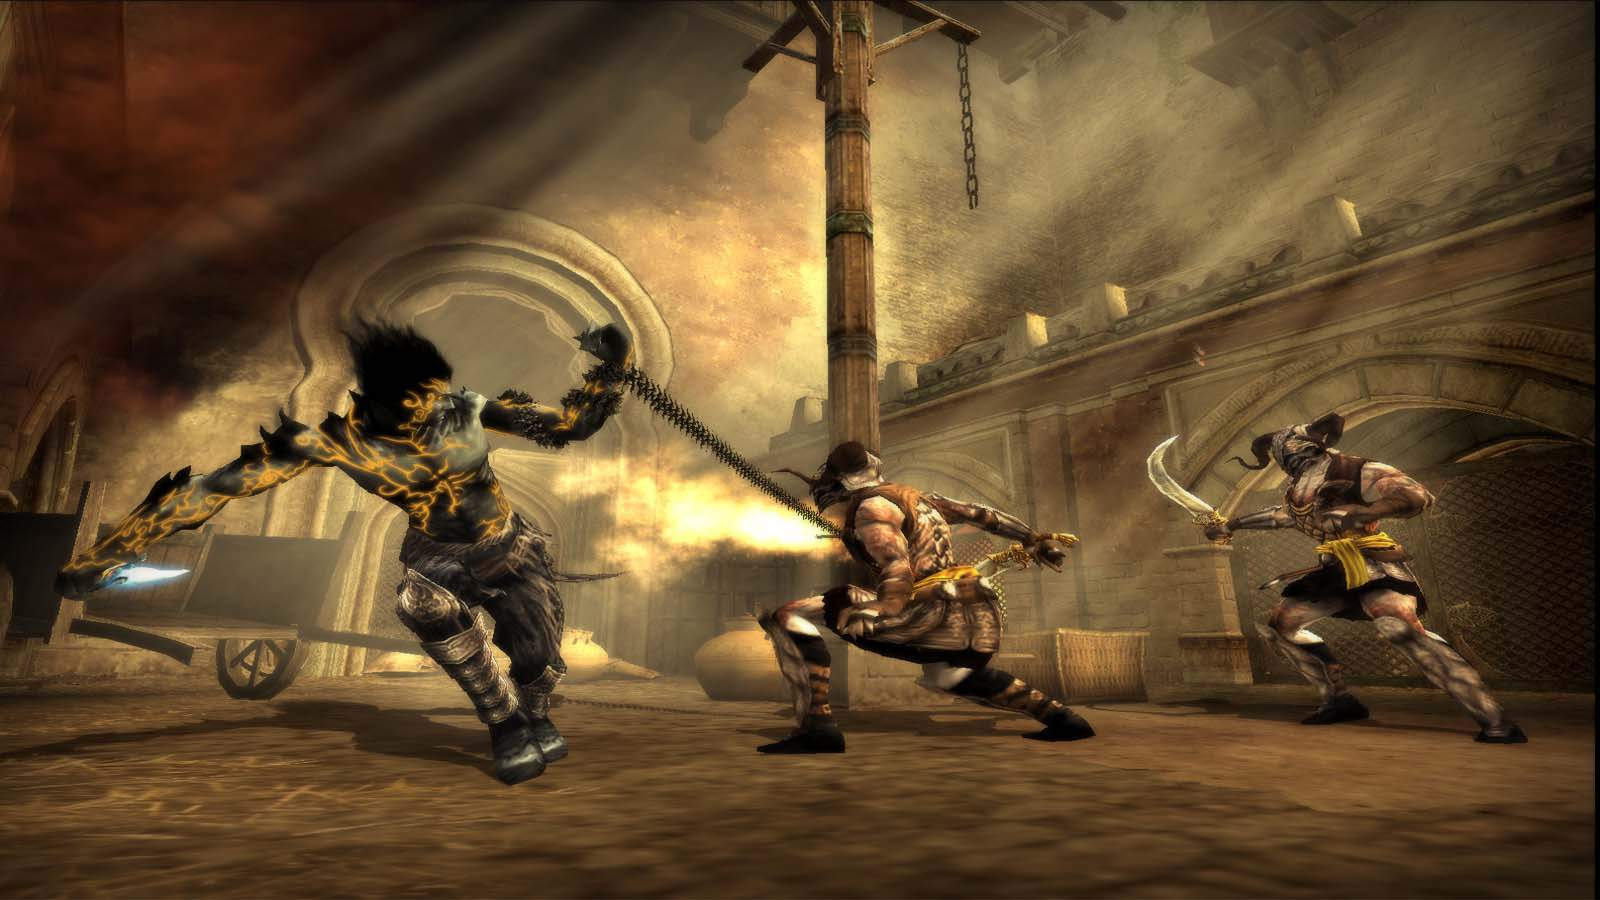 تحميل لعبة Prince Of Persia 3 مضغوطة برابط واحد مباشر كاملة مجانا